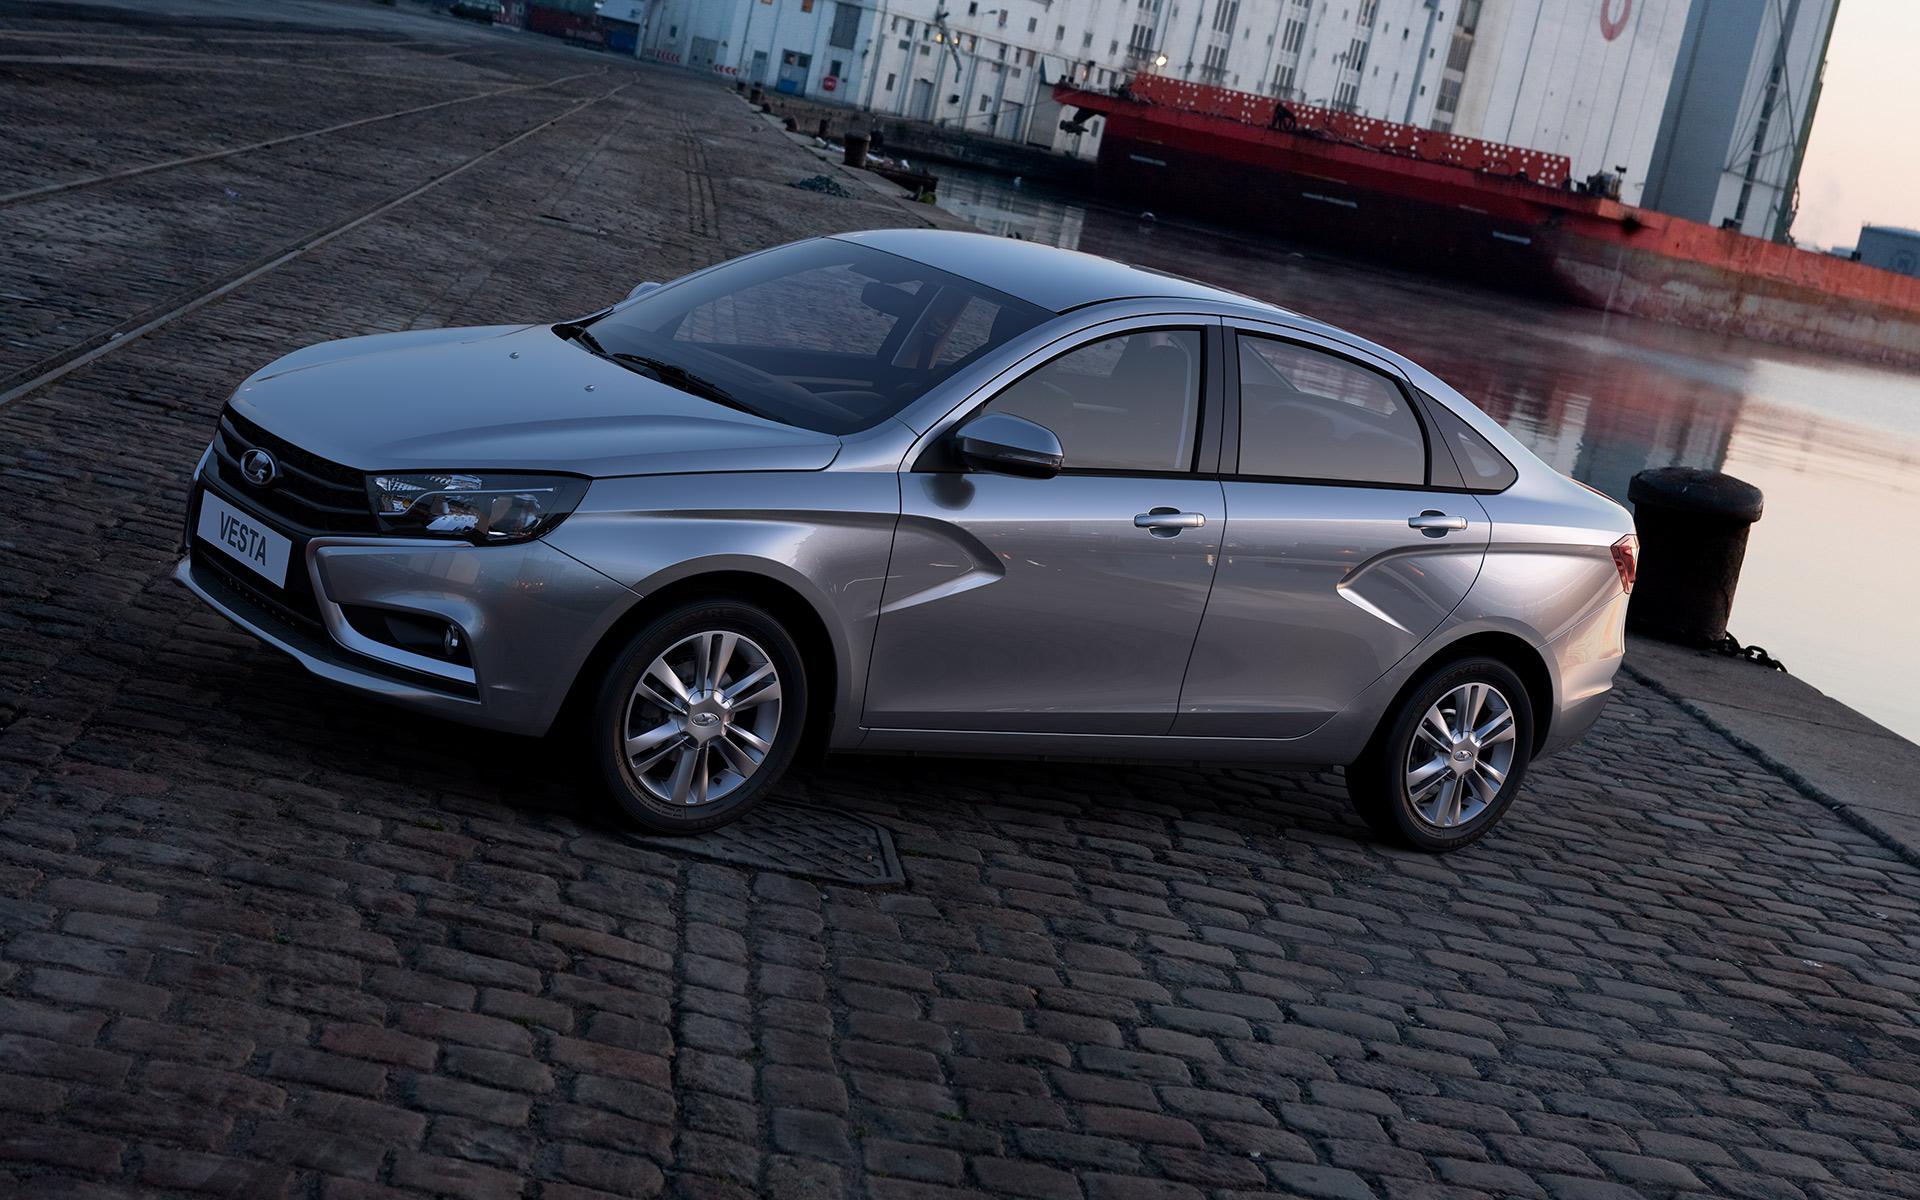 Lada Vesta Sedan Review Lada Official Website